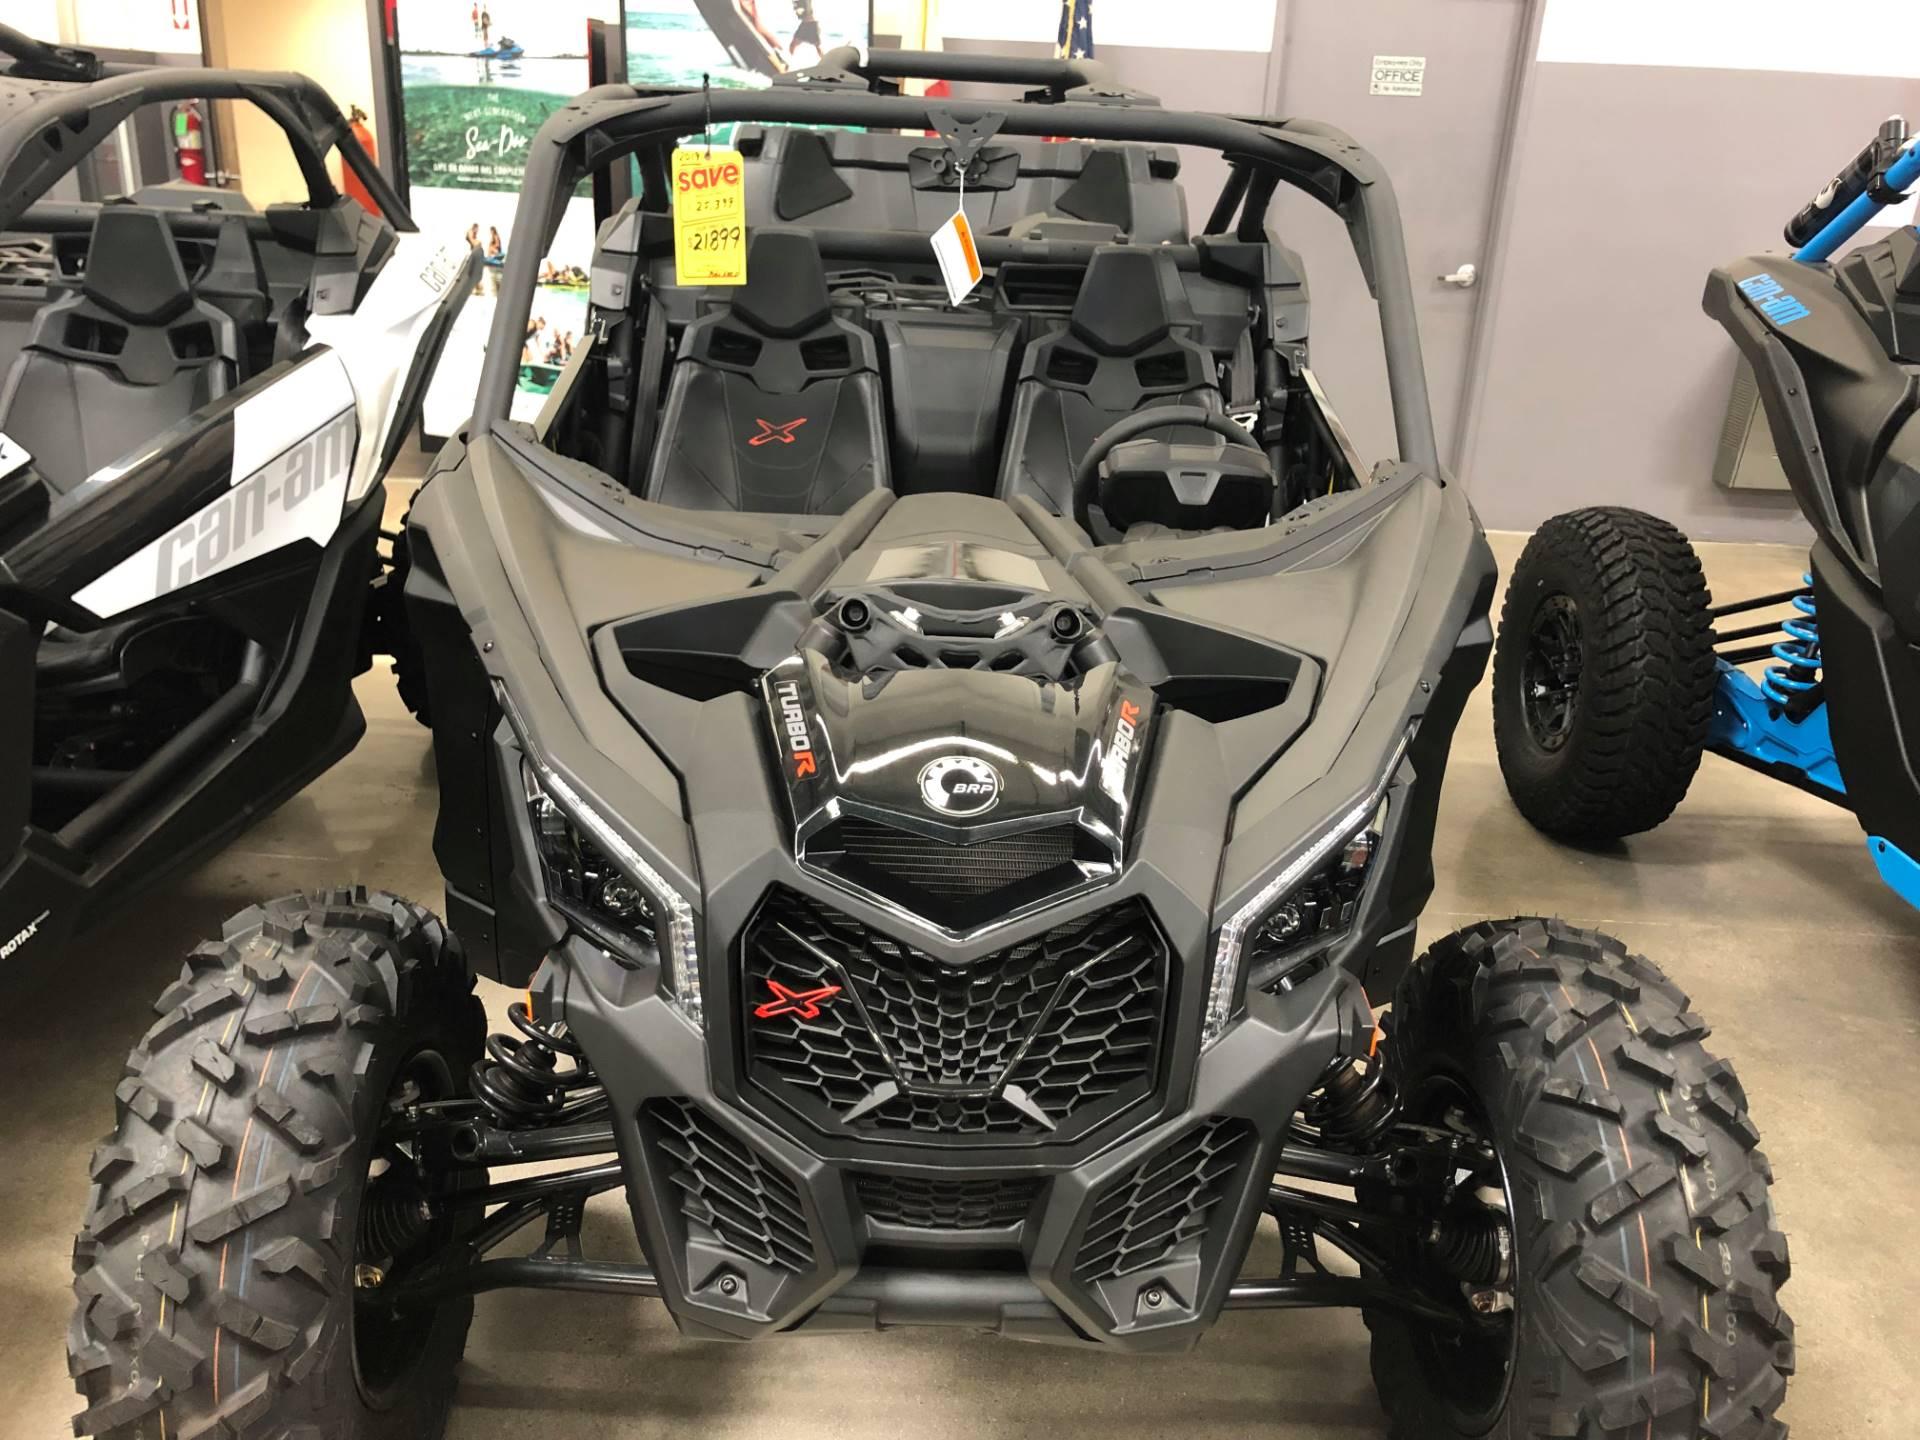 2019 Can-Am™ Maverick X3 X ds Turbo R 1